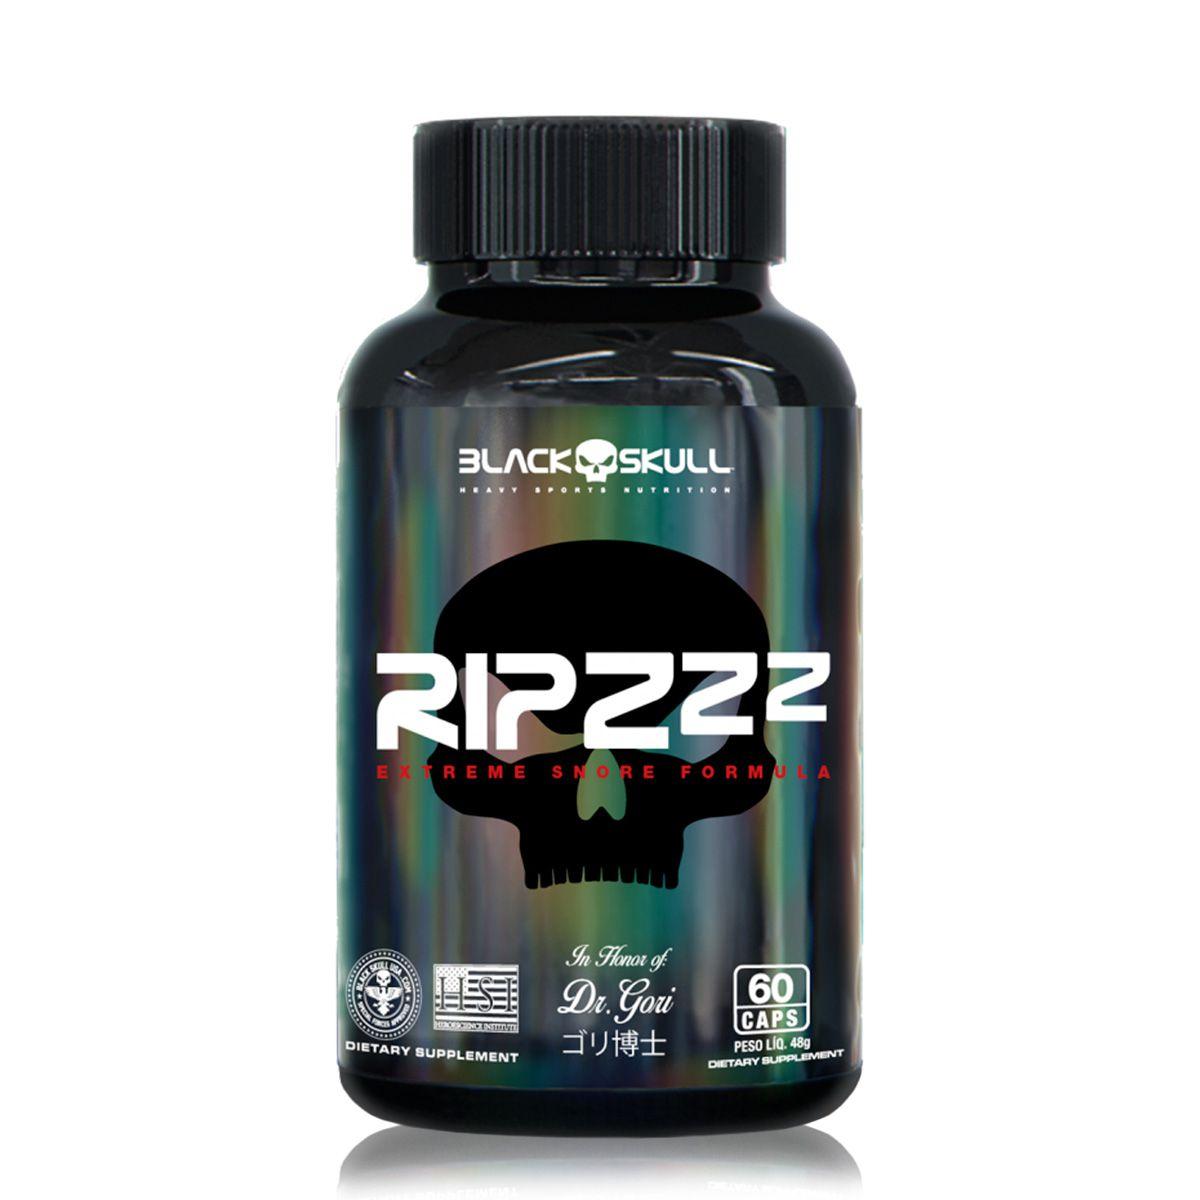 Ripzzz Triptofano 450mg 60 Tabletes - Black Skull